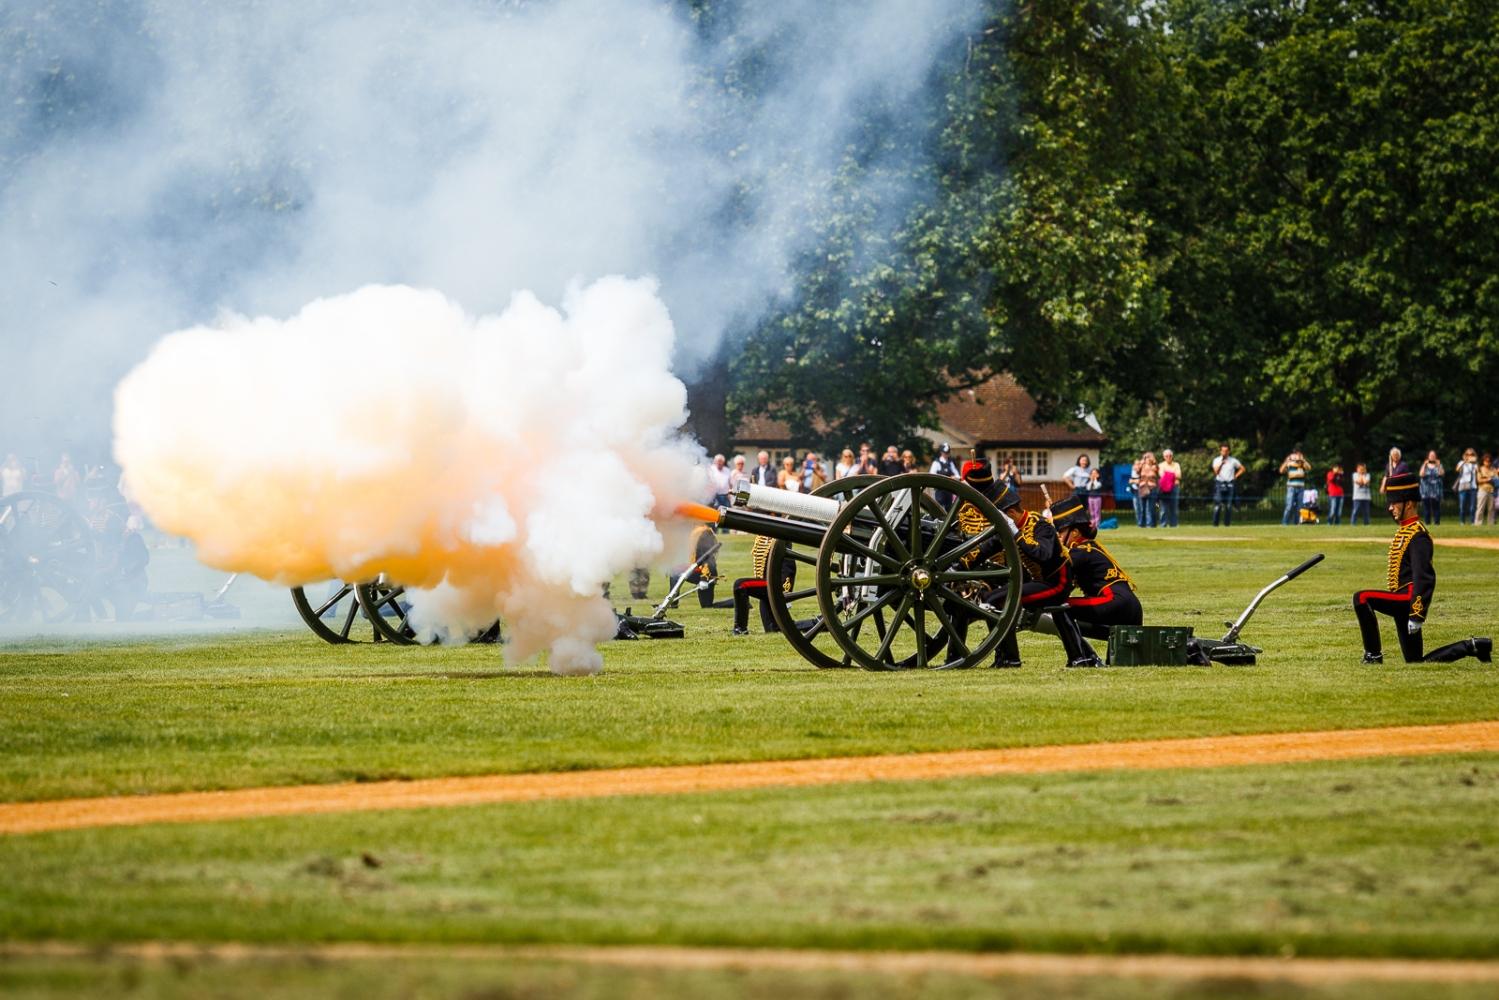 A 41 gun salute for the Duke of Edinburgh's Birthday in London A gun is reloaded during a 41 gun royal salute to mark the the Duke of Edinburgh's Birthday at Hyde Park